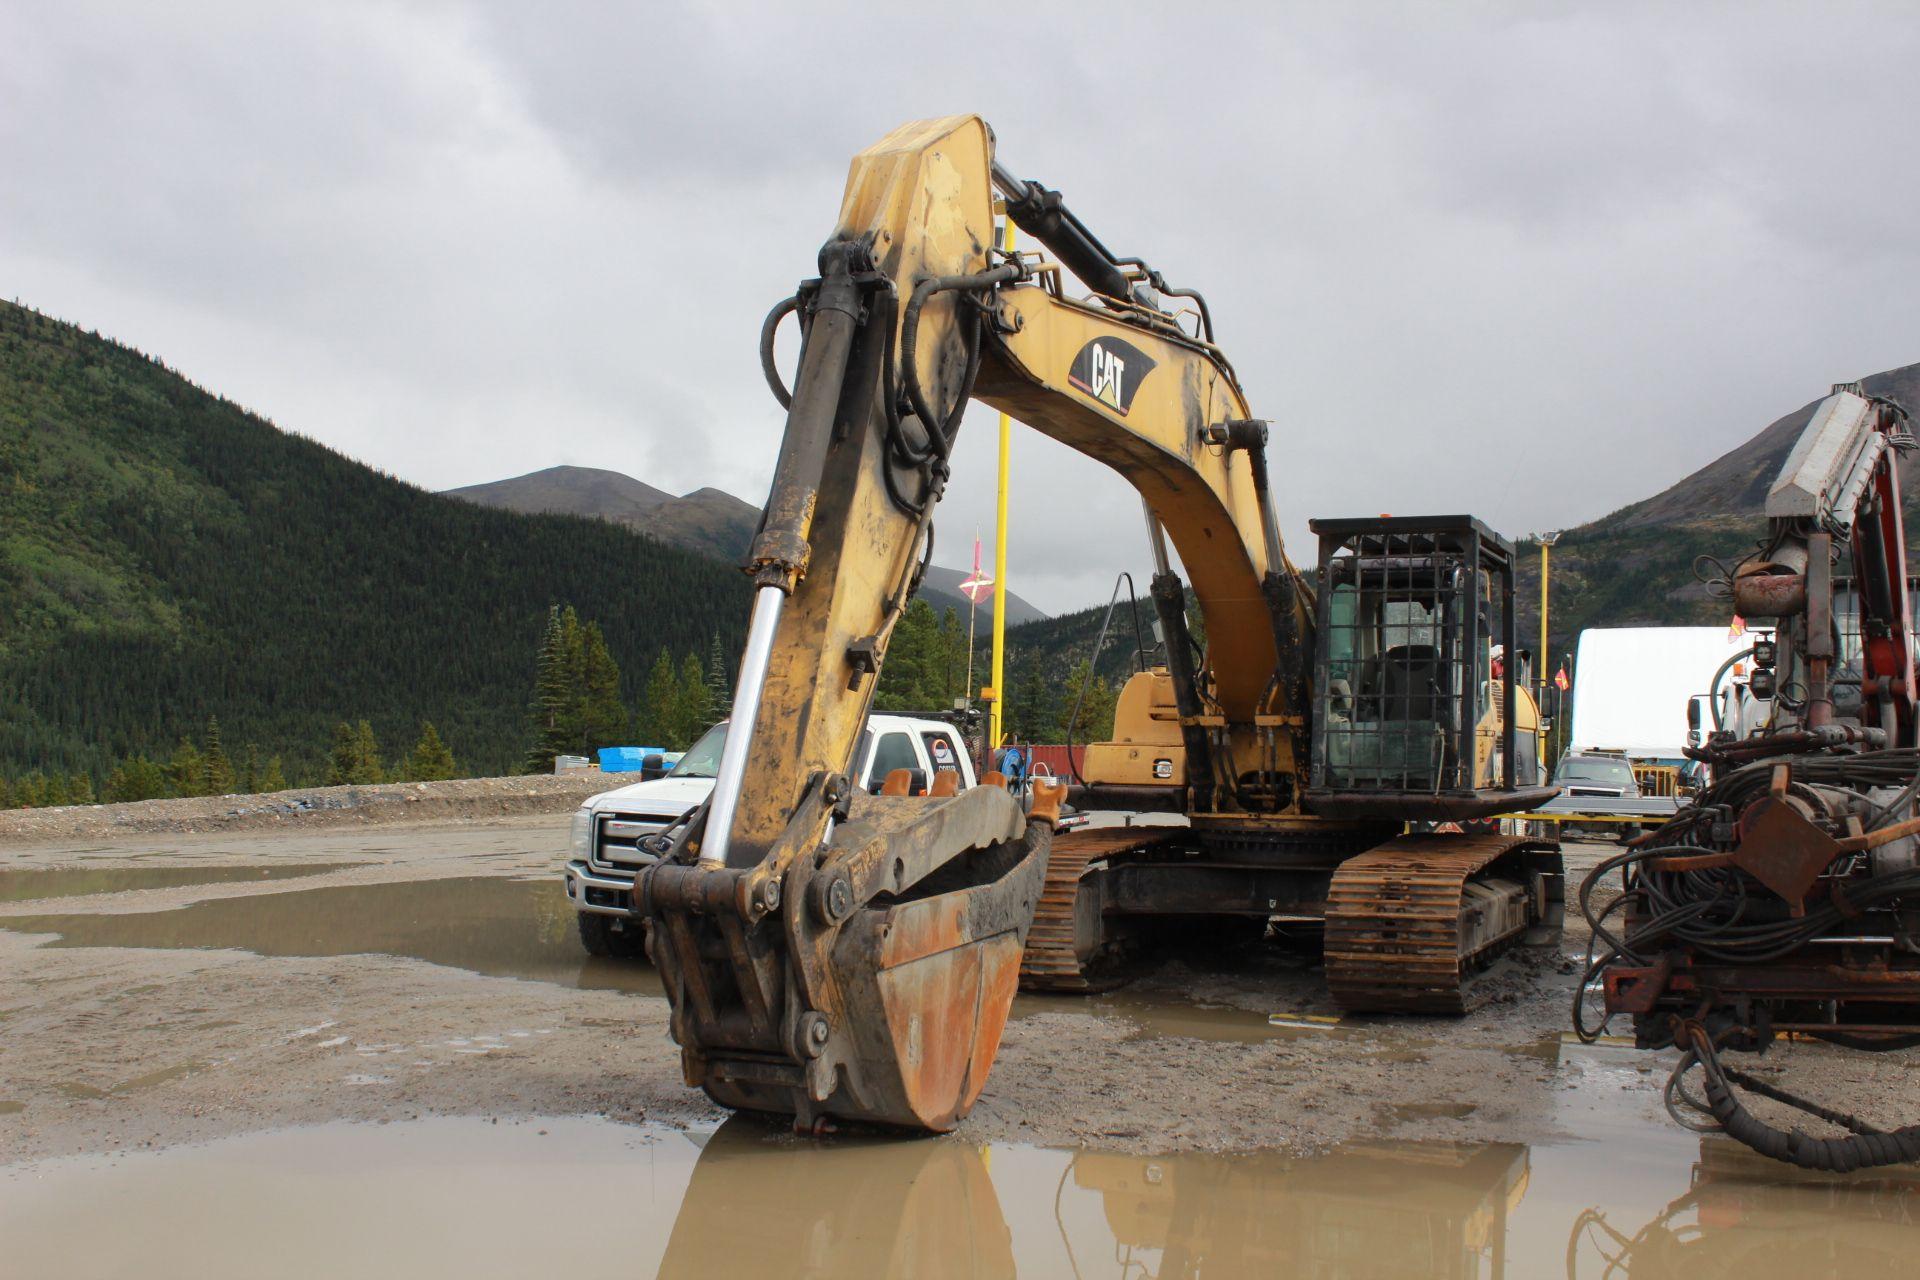 Lot 3 - 2003 Cat 330C Excavator, EROPS, Bush Guard, w/ WBM Bucket w/ Hydraulic Thumb; S/N DKY01549; Meter